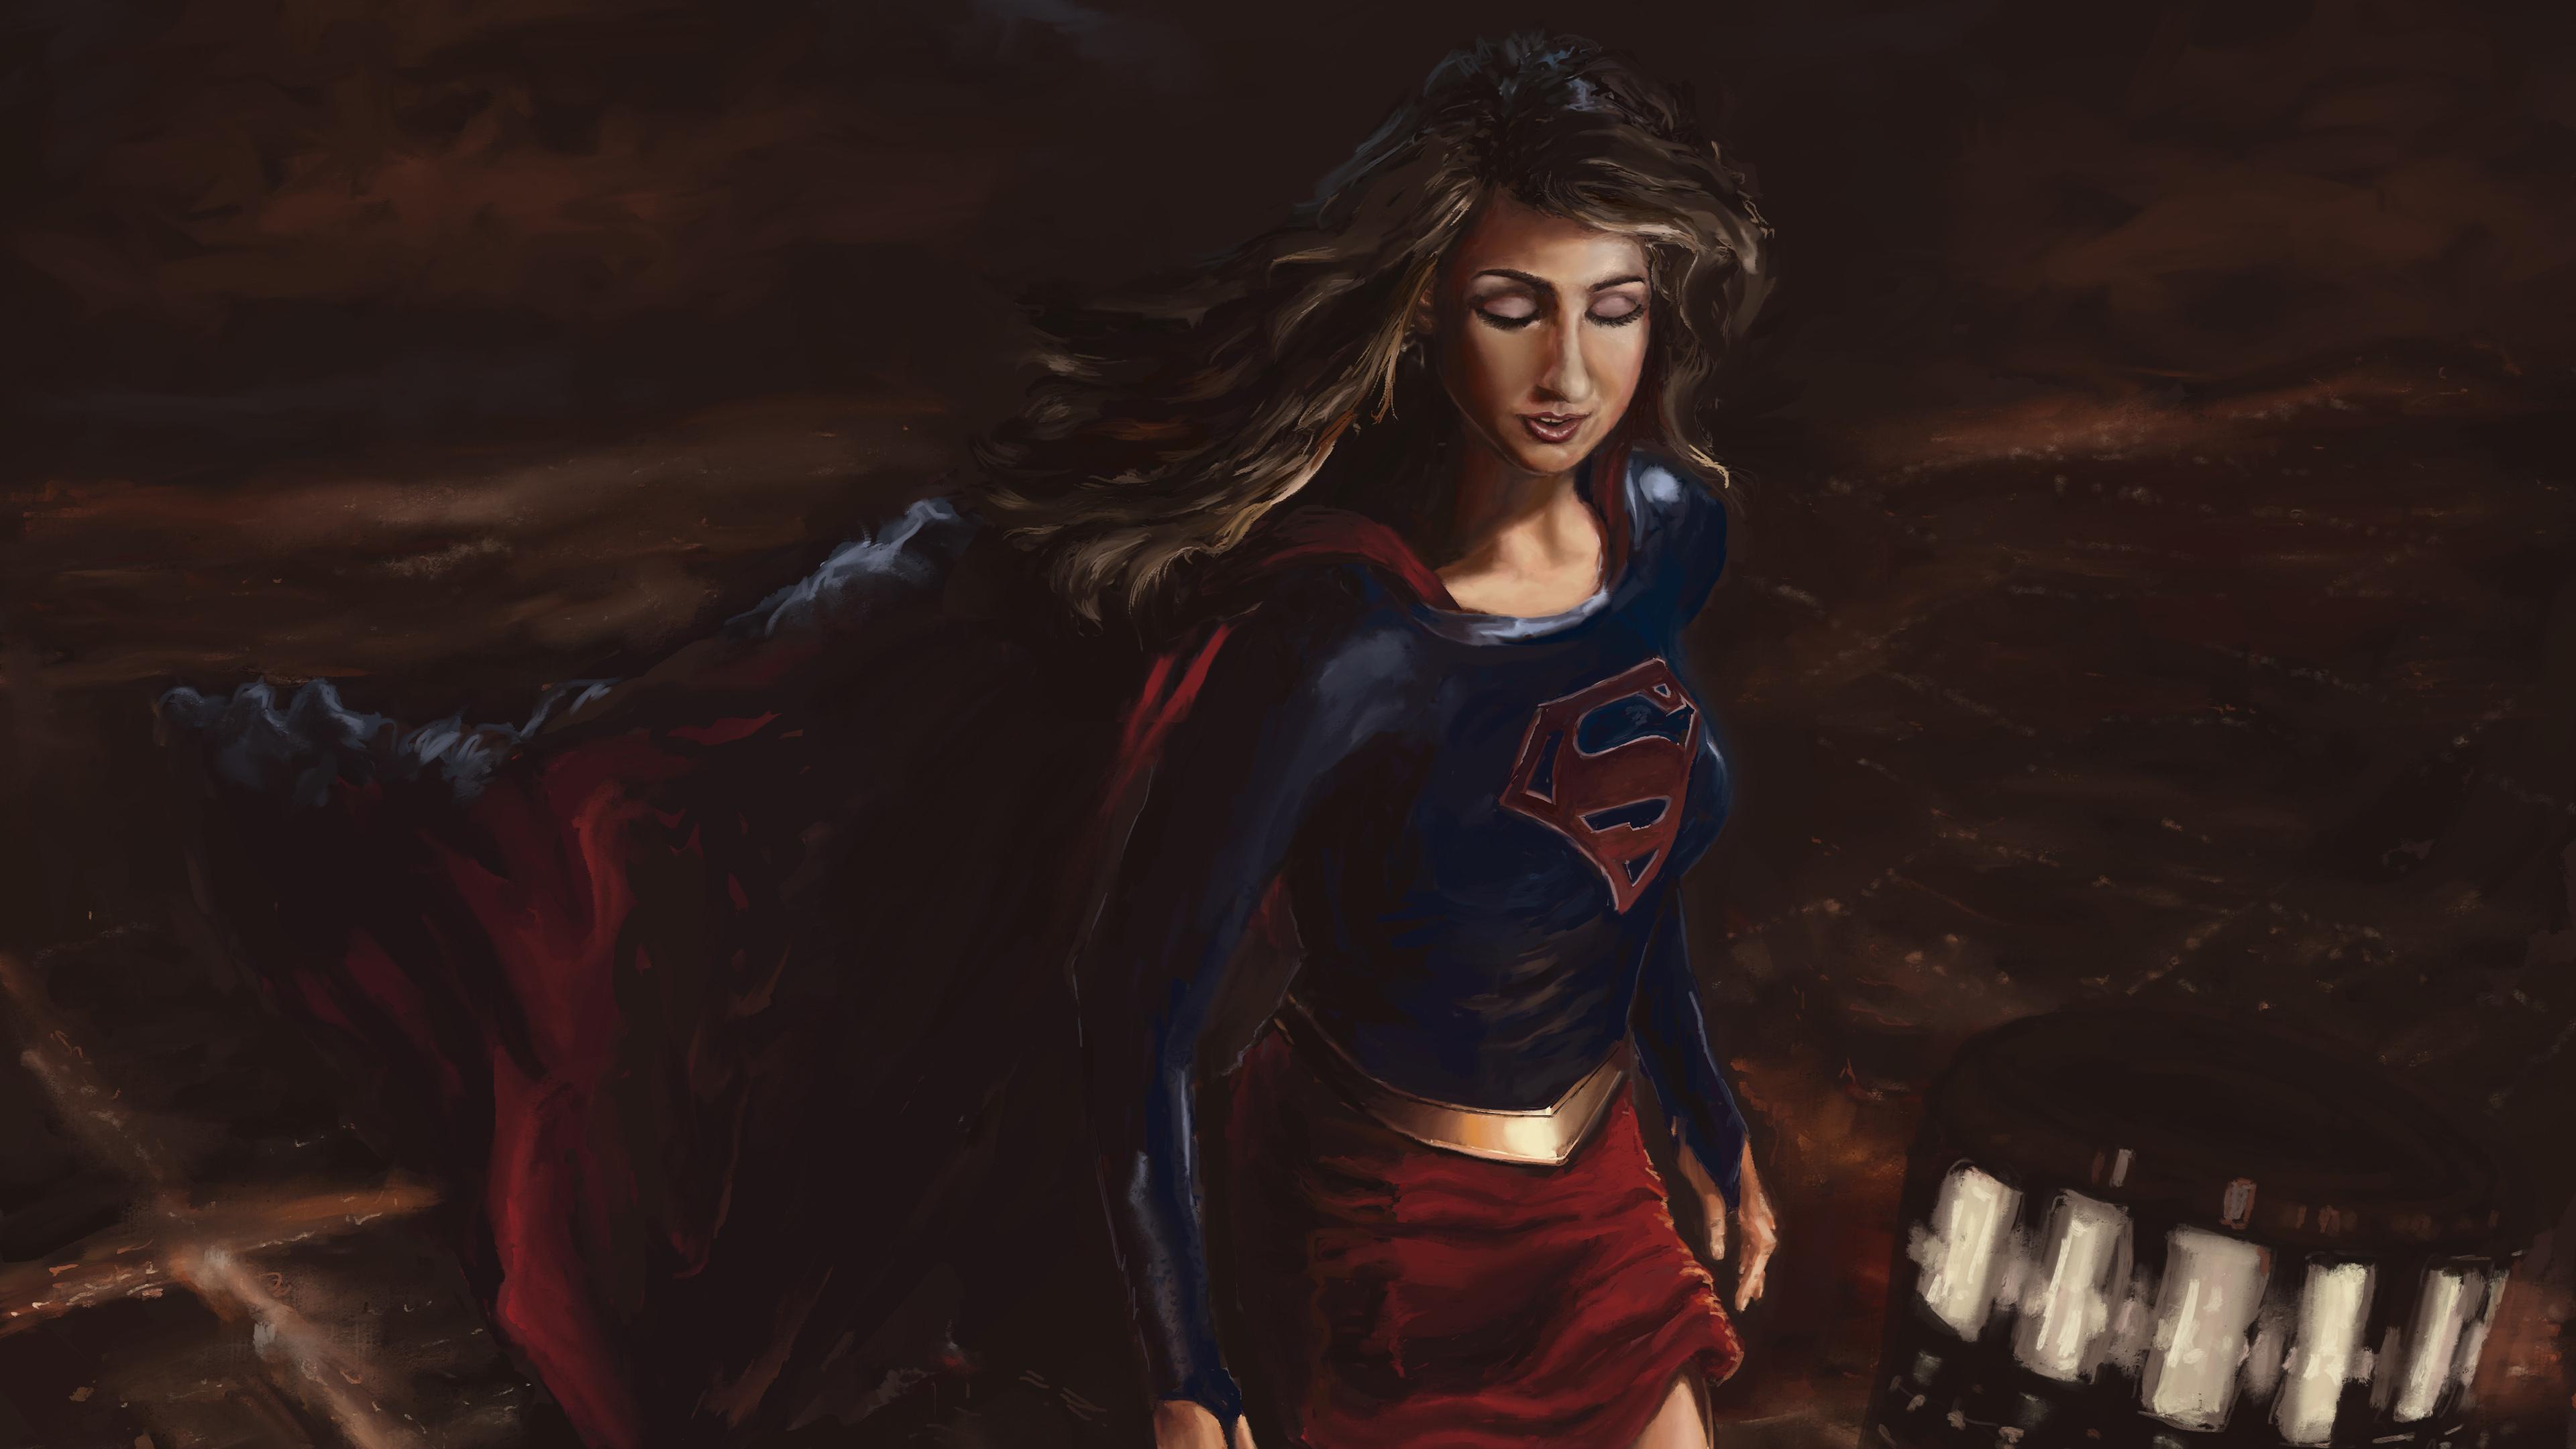 supergirl paint artwork 4k 1557260274 - Supergirl Paint Artwork 4k - superheroes wallpapers, supergirl wallpapers, hd-wallpapers, digital art wallpapers, behance wallpapers, artwork wallpapers, 4k-wallpapers